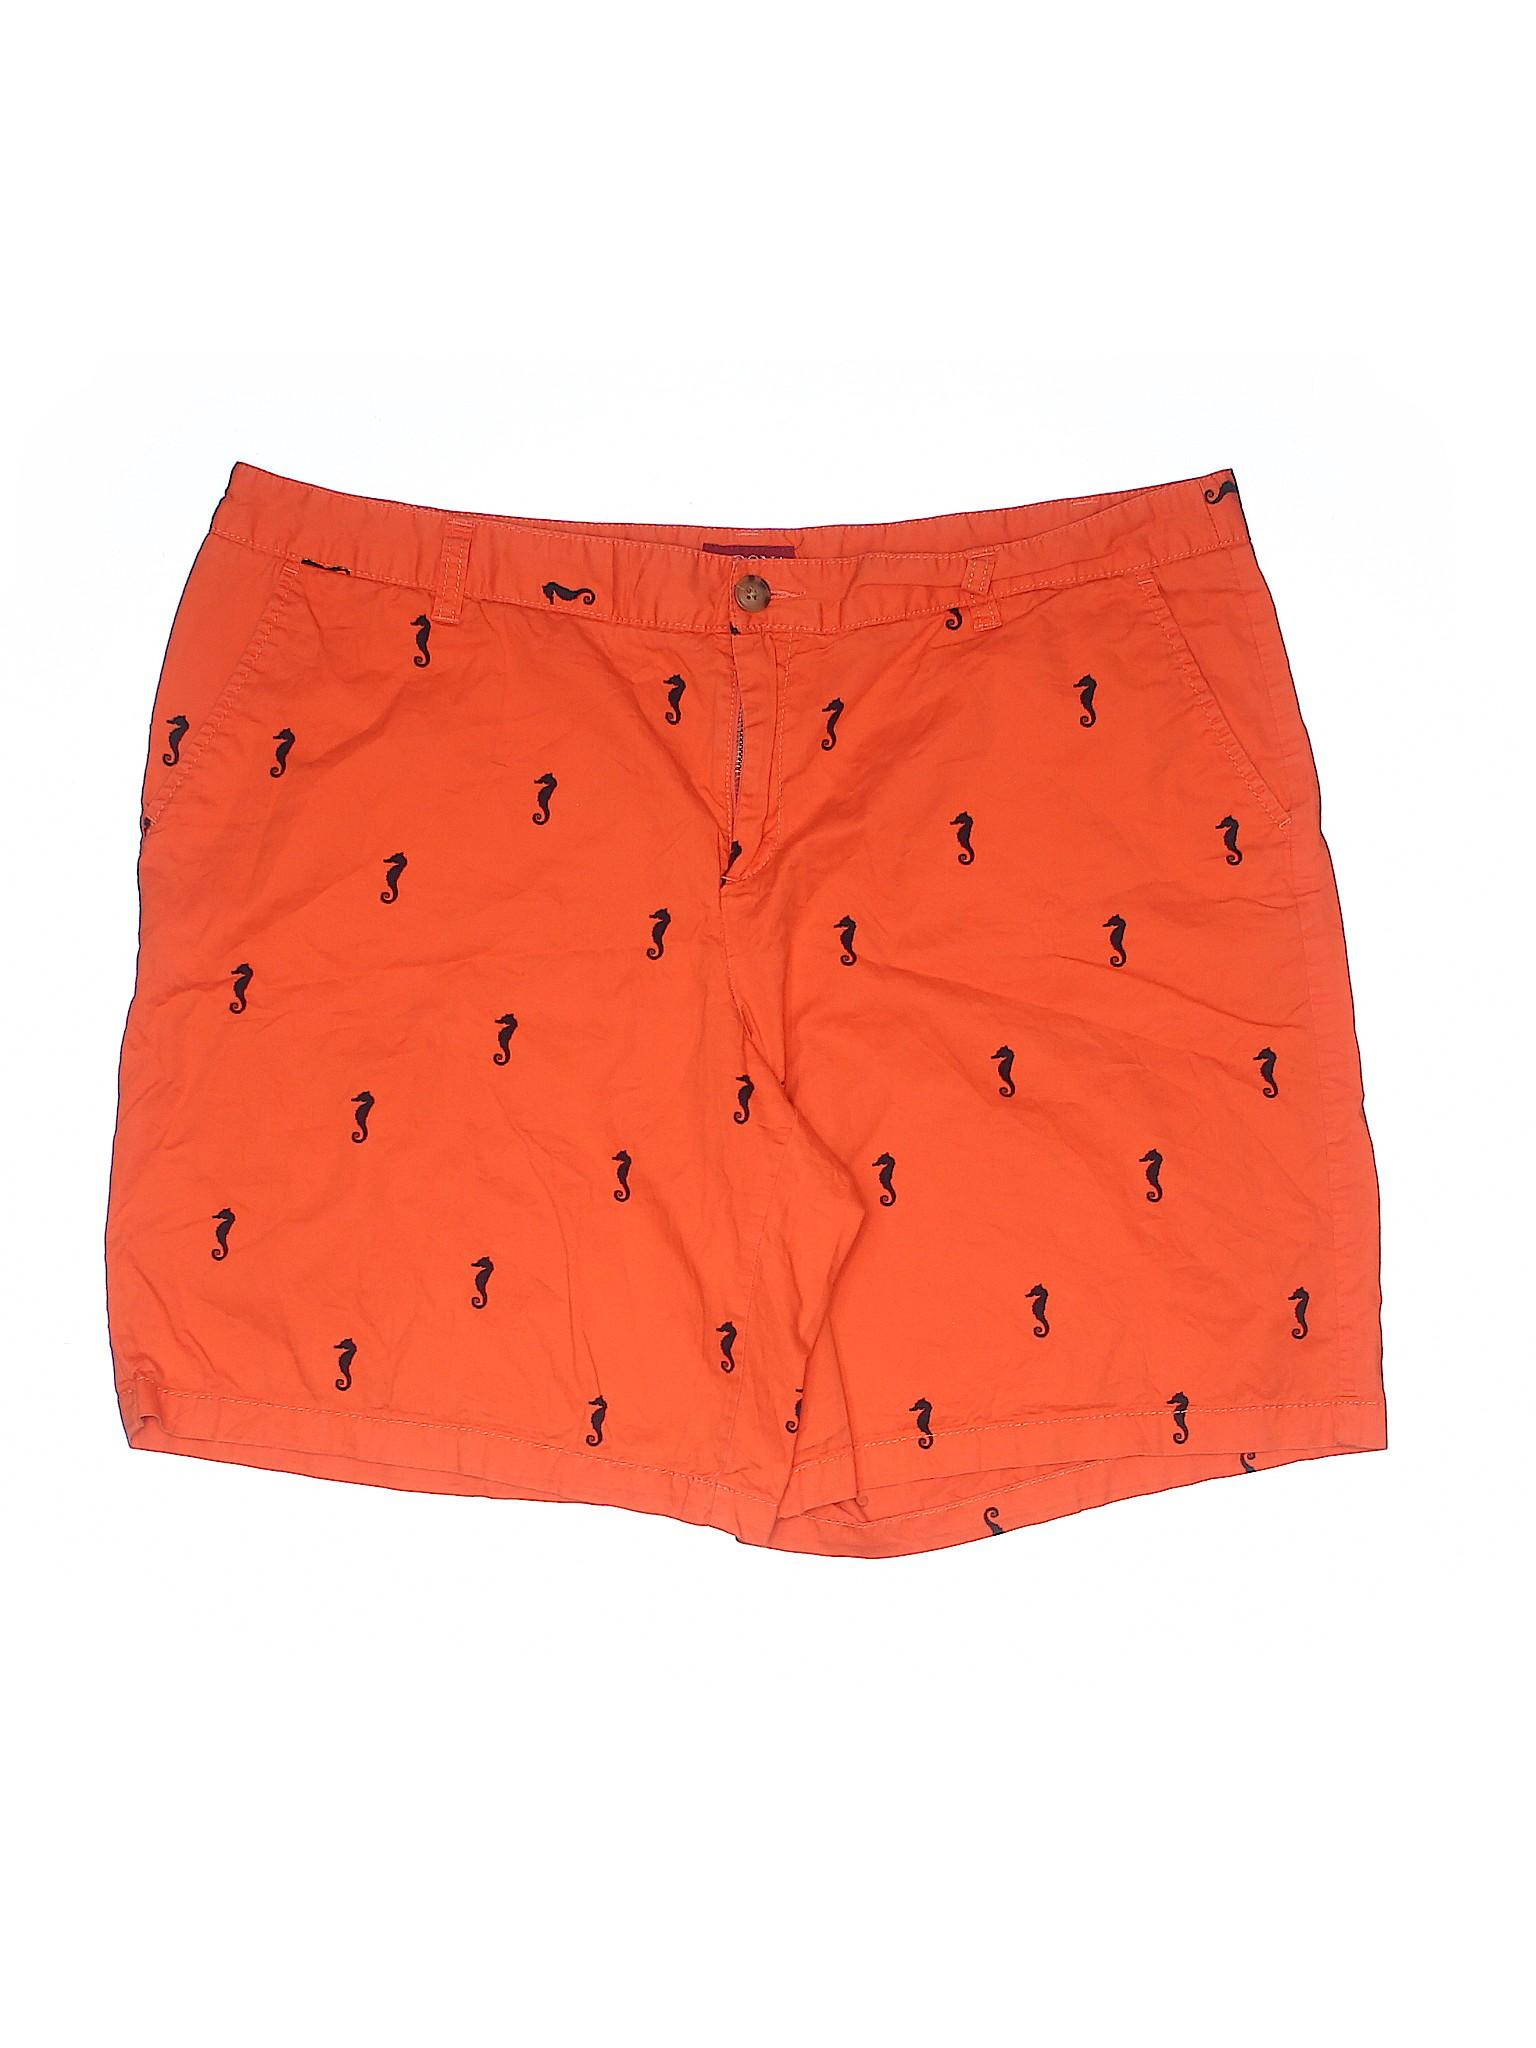 Shorts Boutique Khaki Boutique Merona Merona wIHqXgxxP